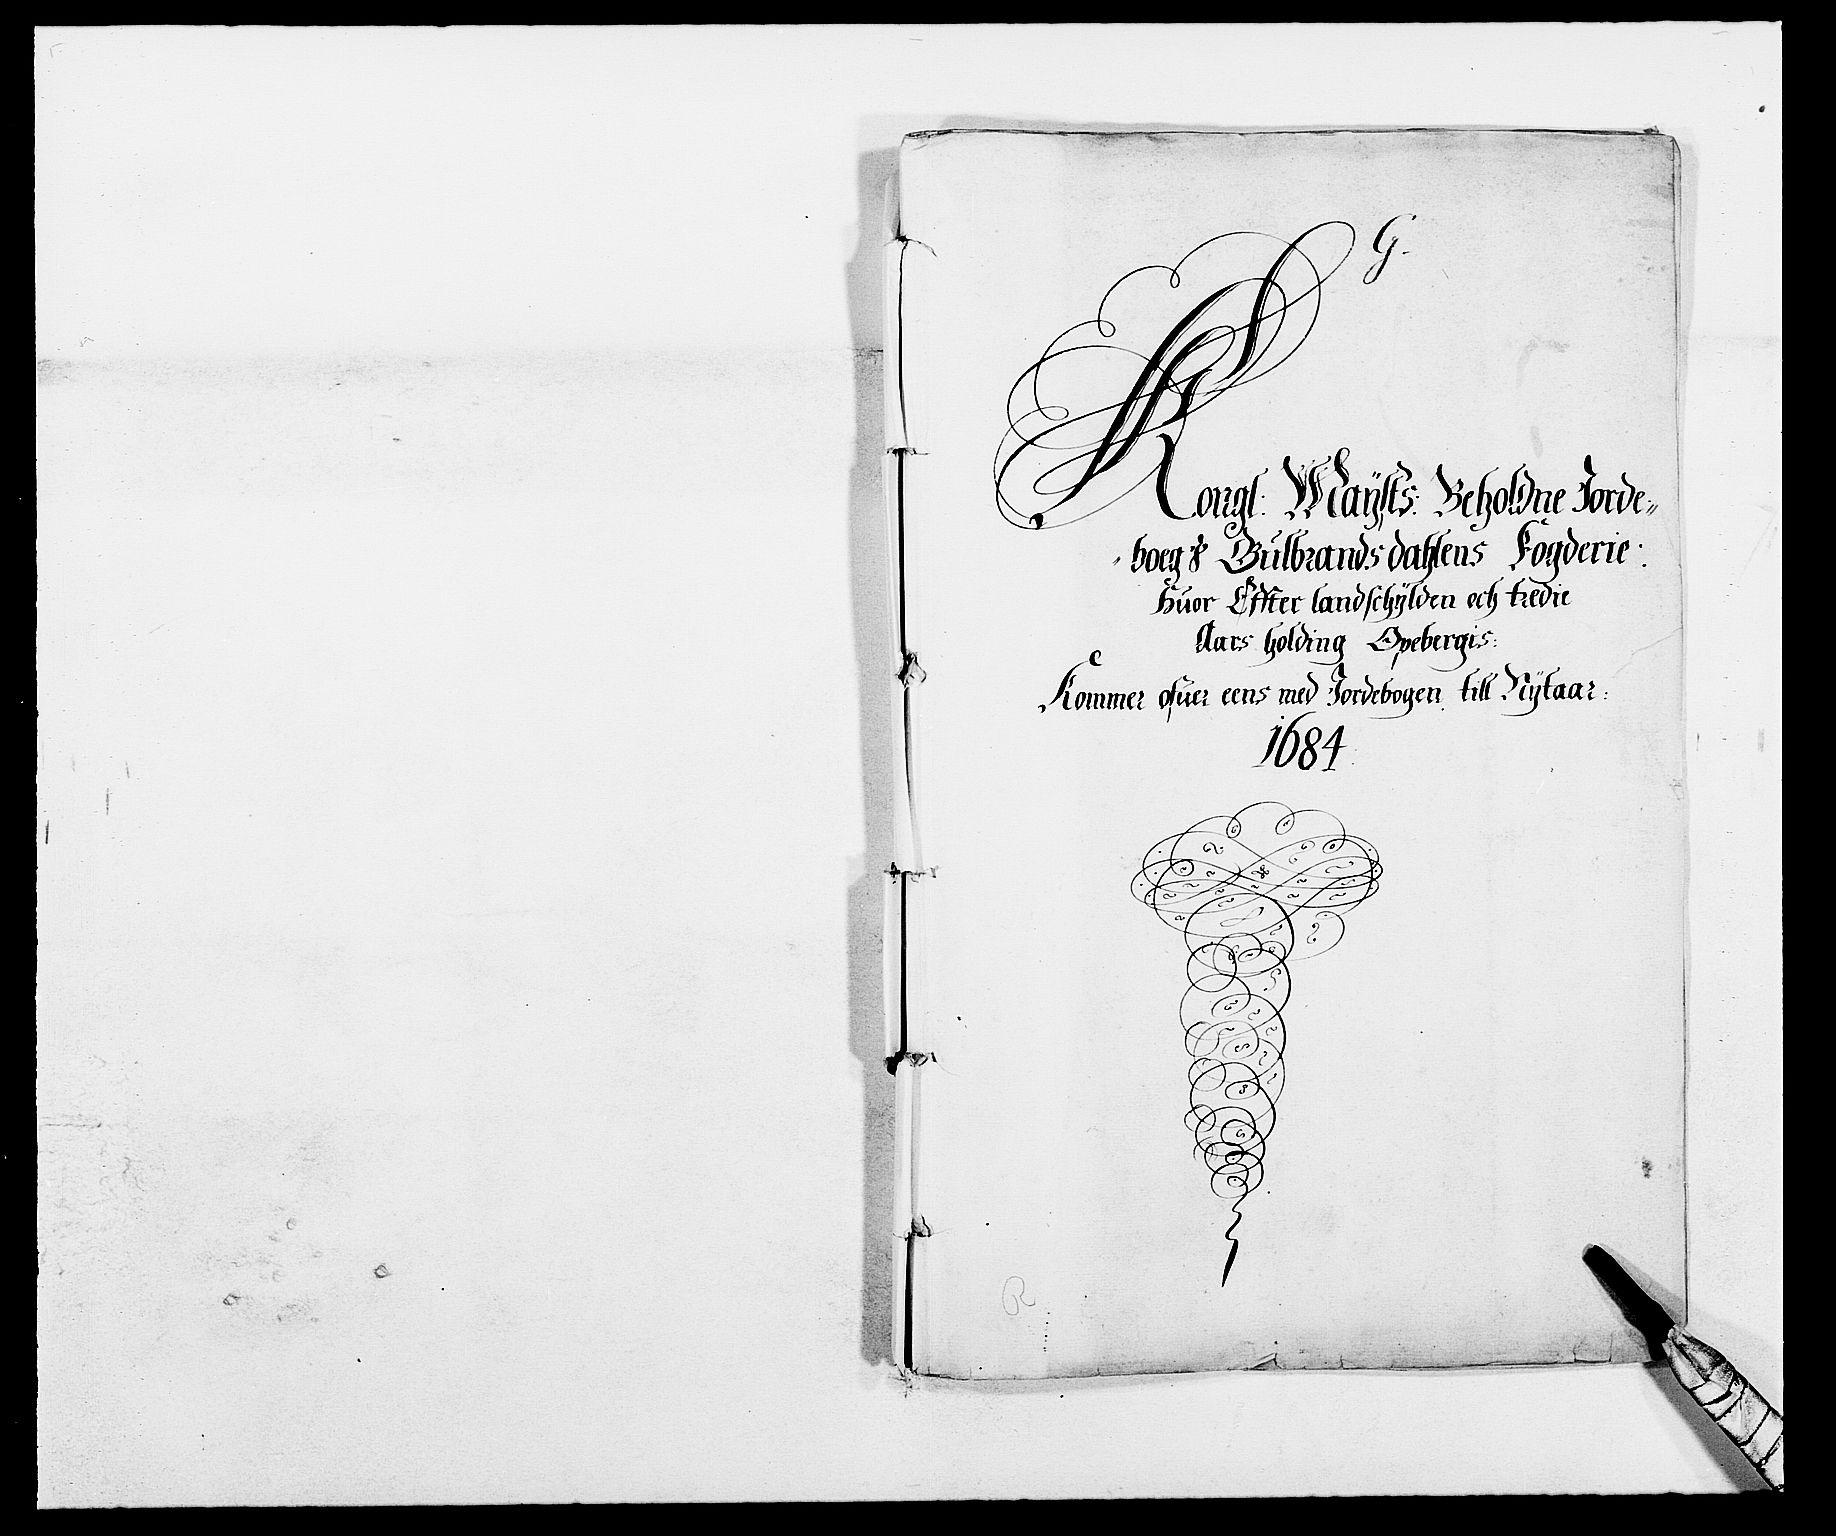 RA, Rentekammeret inntil 1814, Reviderte regnskaper, Fogderegnskap, R17/L1159: Fogderegnskap Gudbrandsdal, 1682-1689, s. 55